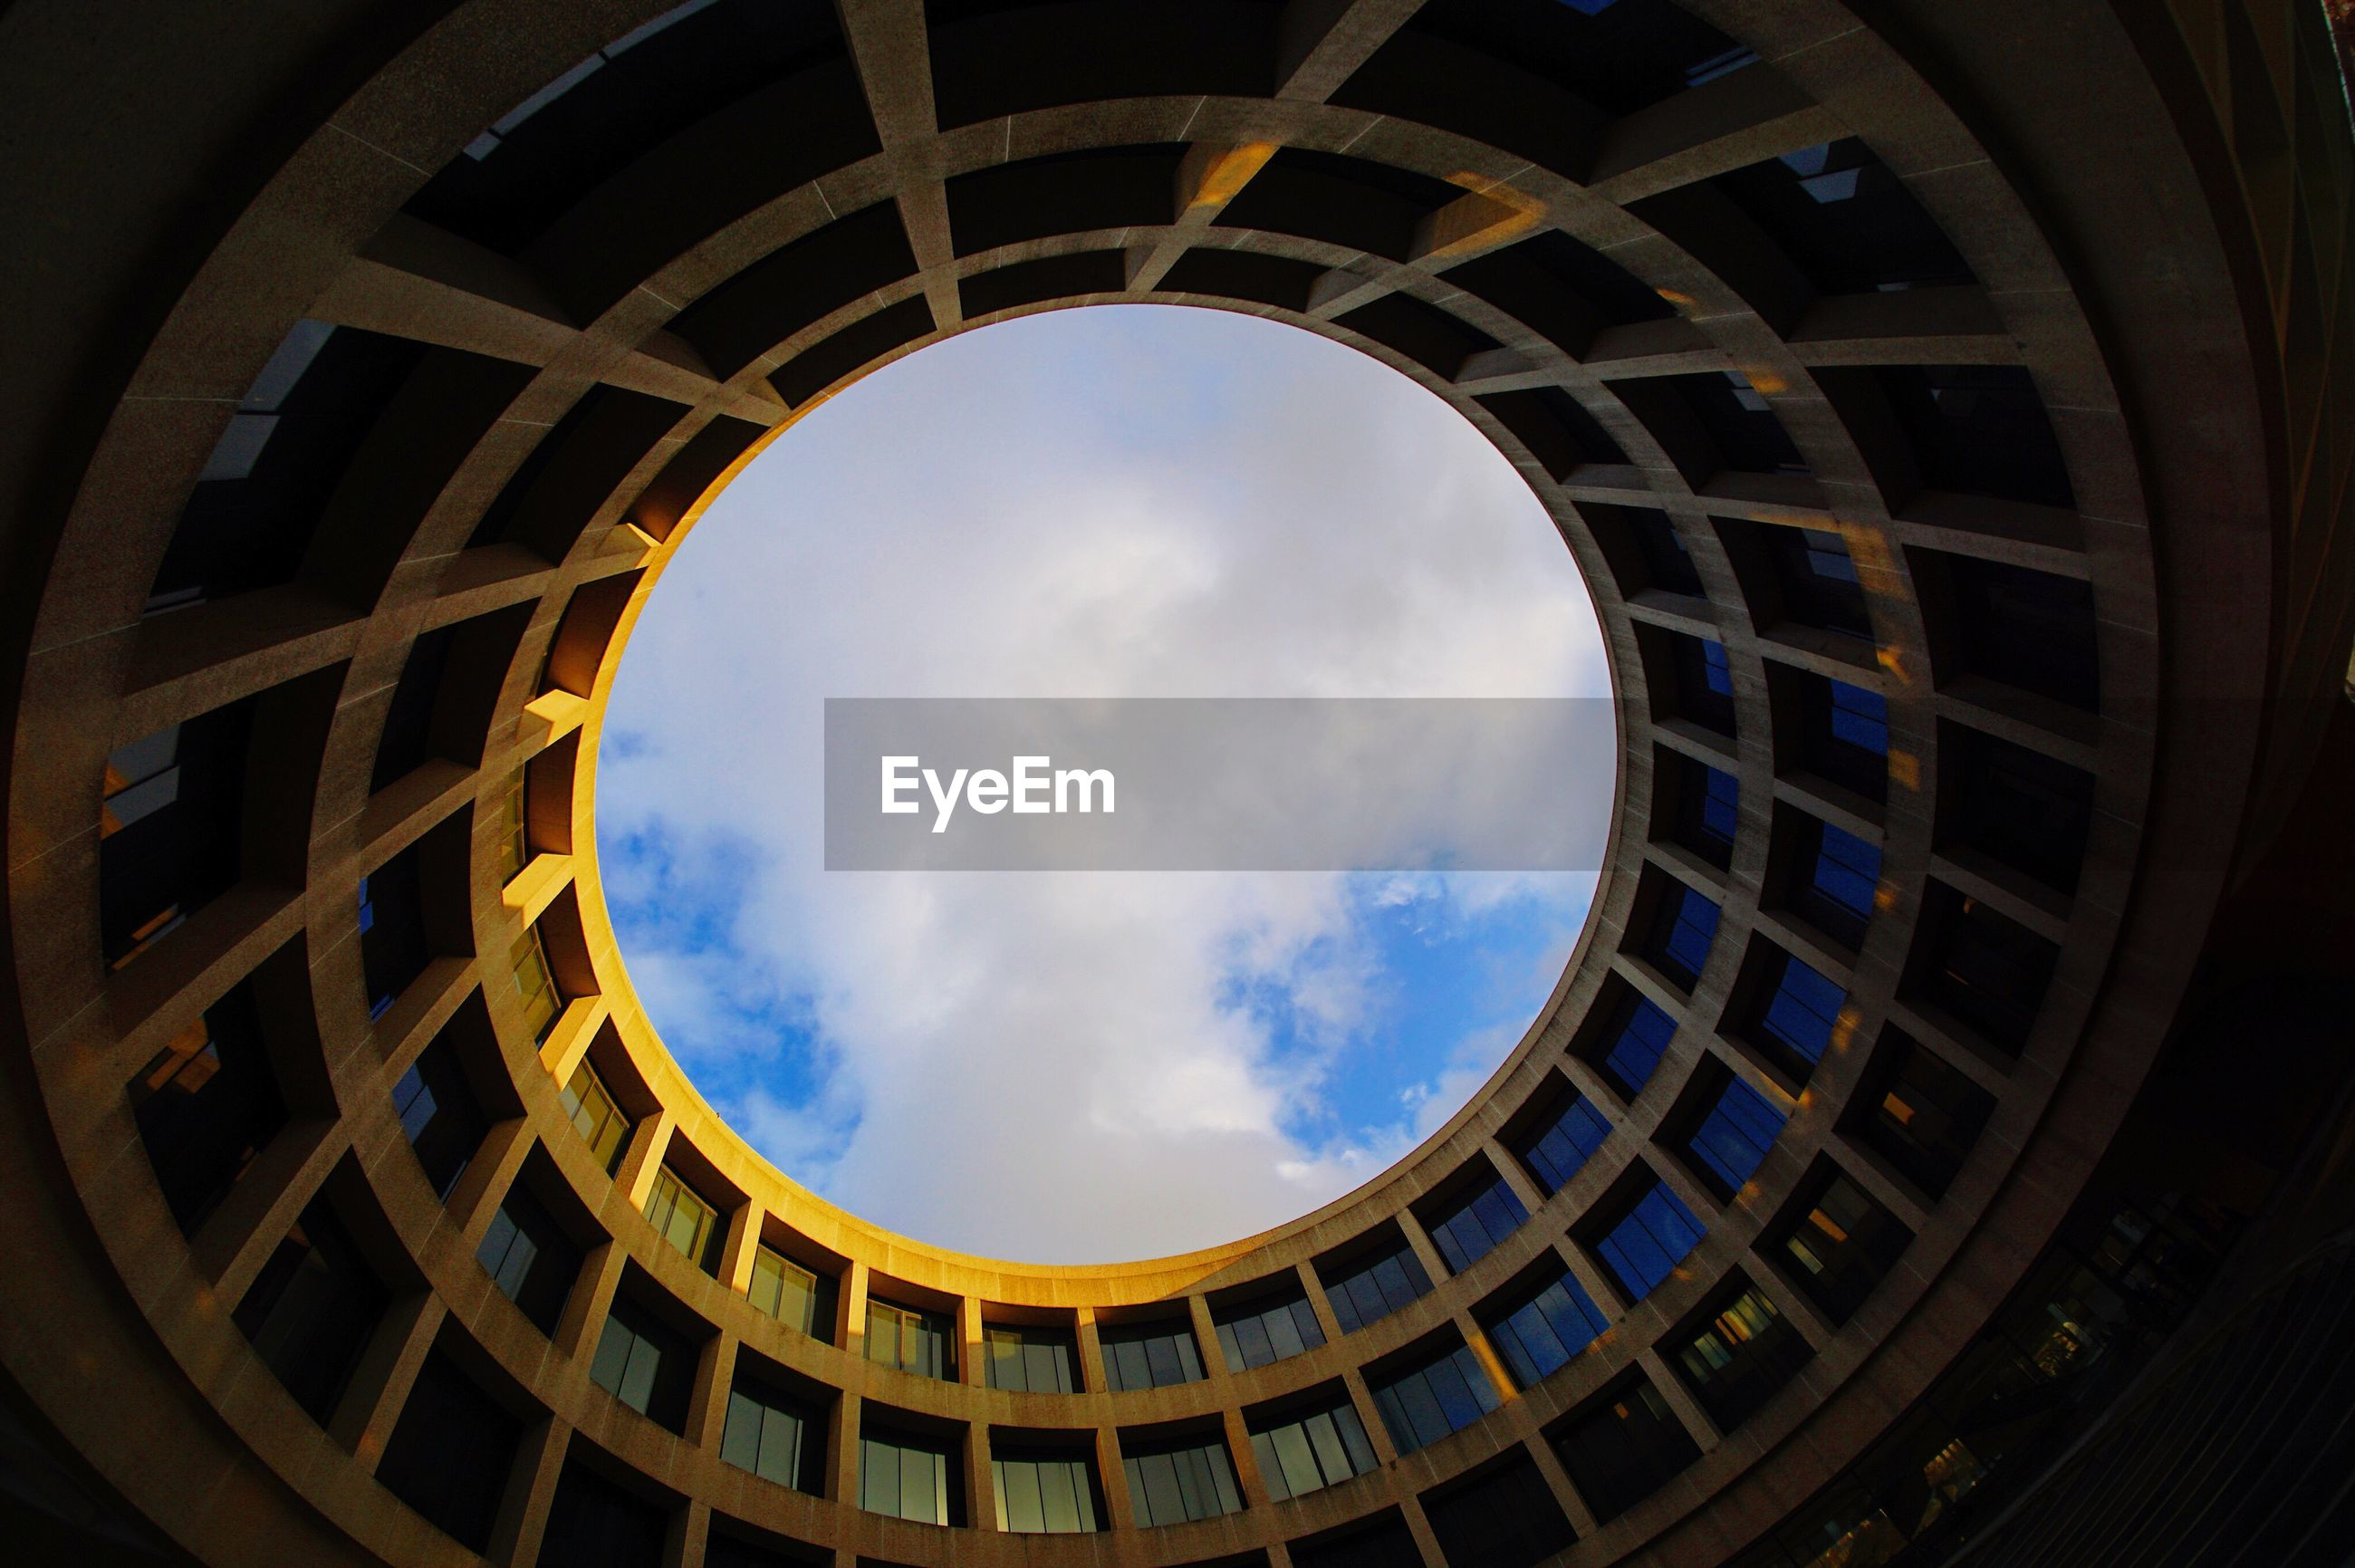 Directly below shot of hirshhorn museum and sculpture garden against sky